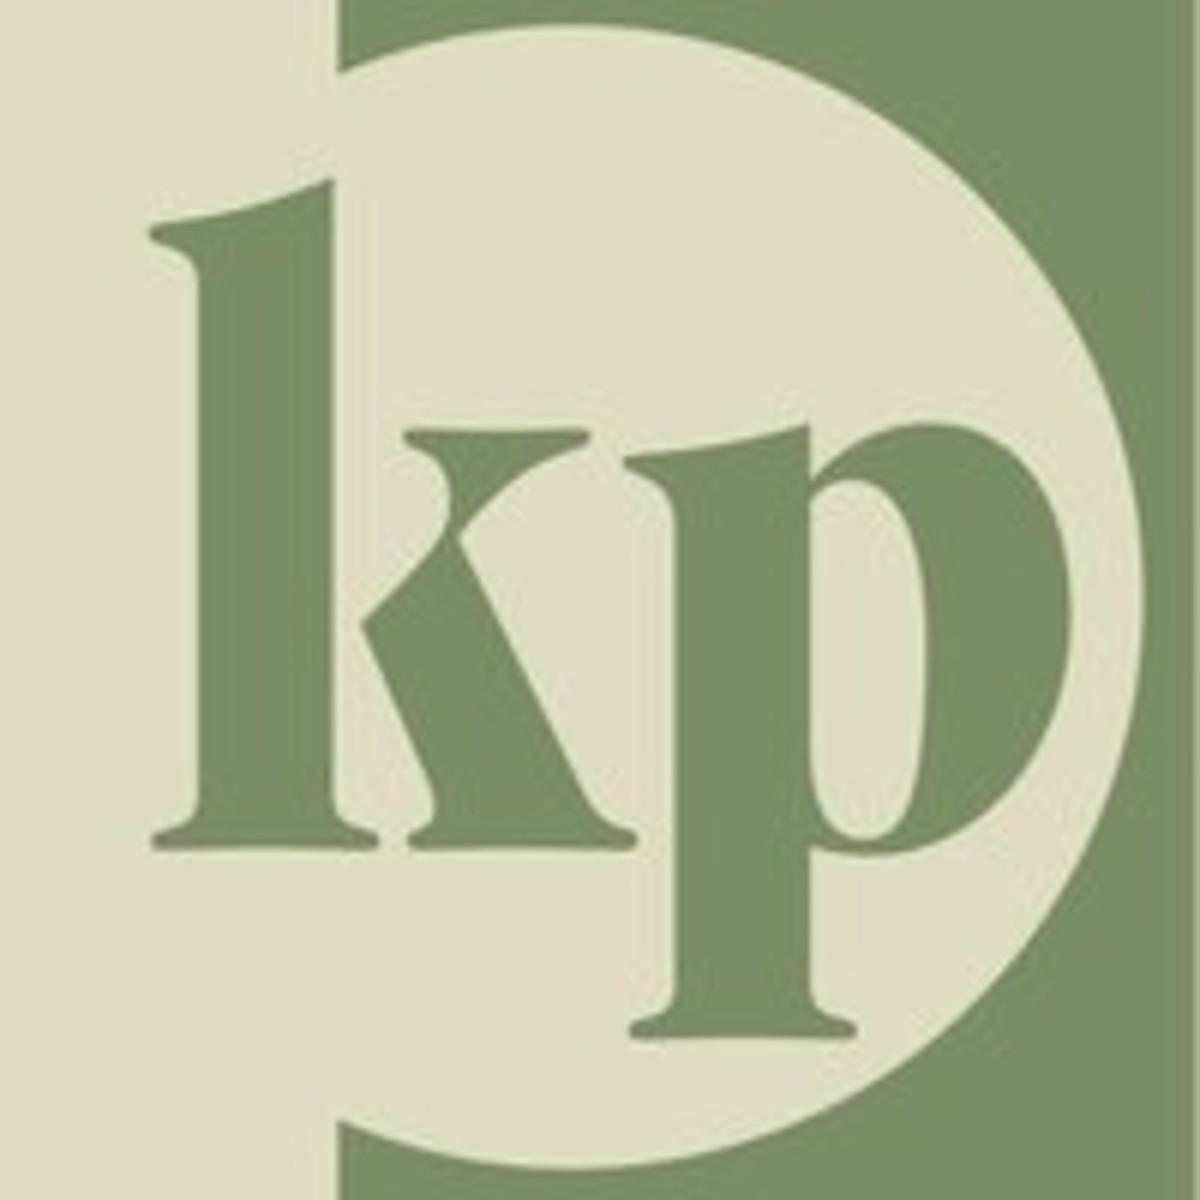 krause publications logo